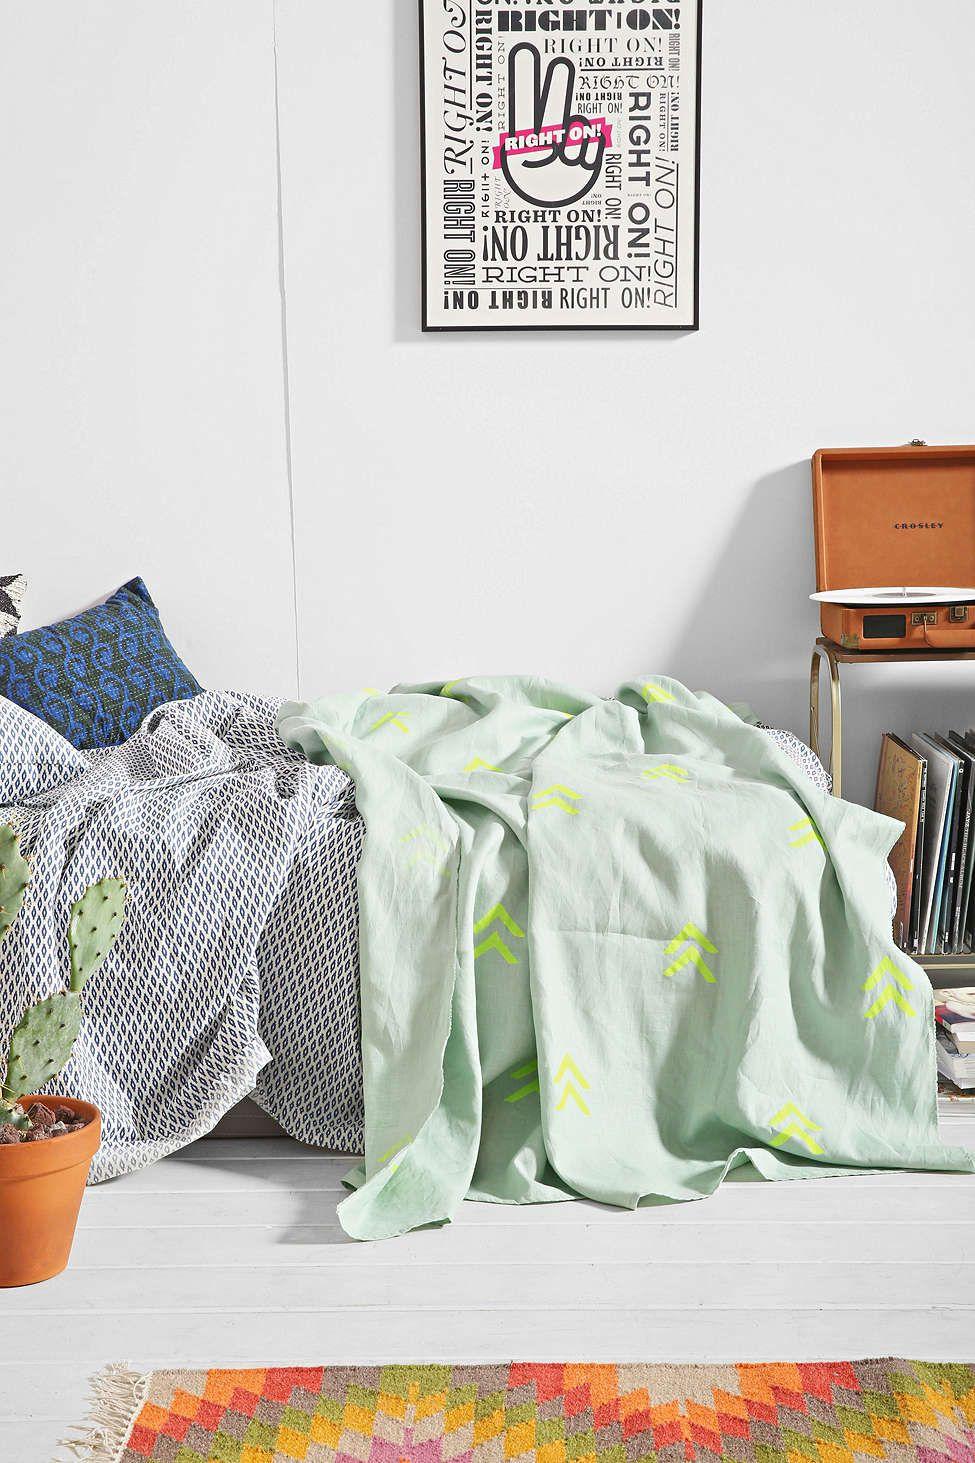 What Is A Throw Blanket Caroline Zhurley Sam Throw Blanket  Interior Fun  Pinterest